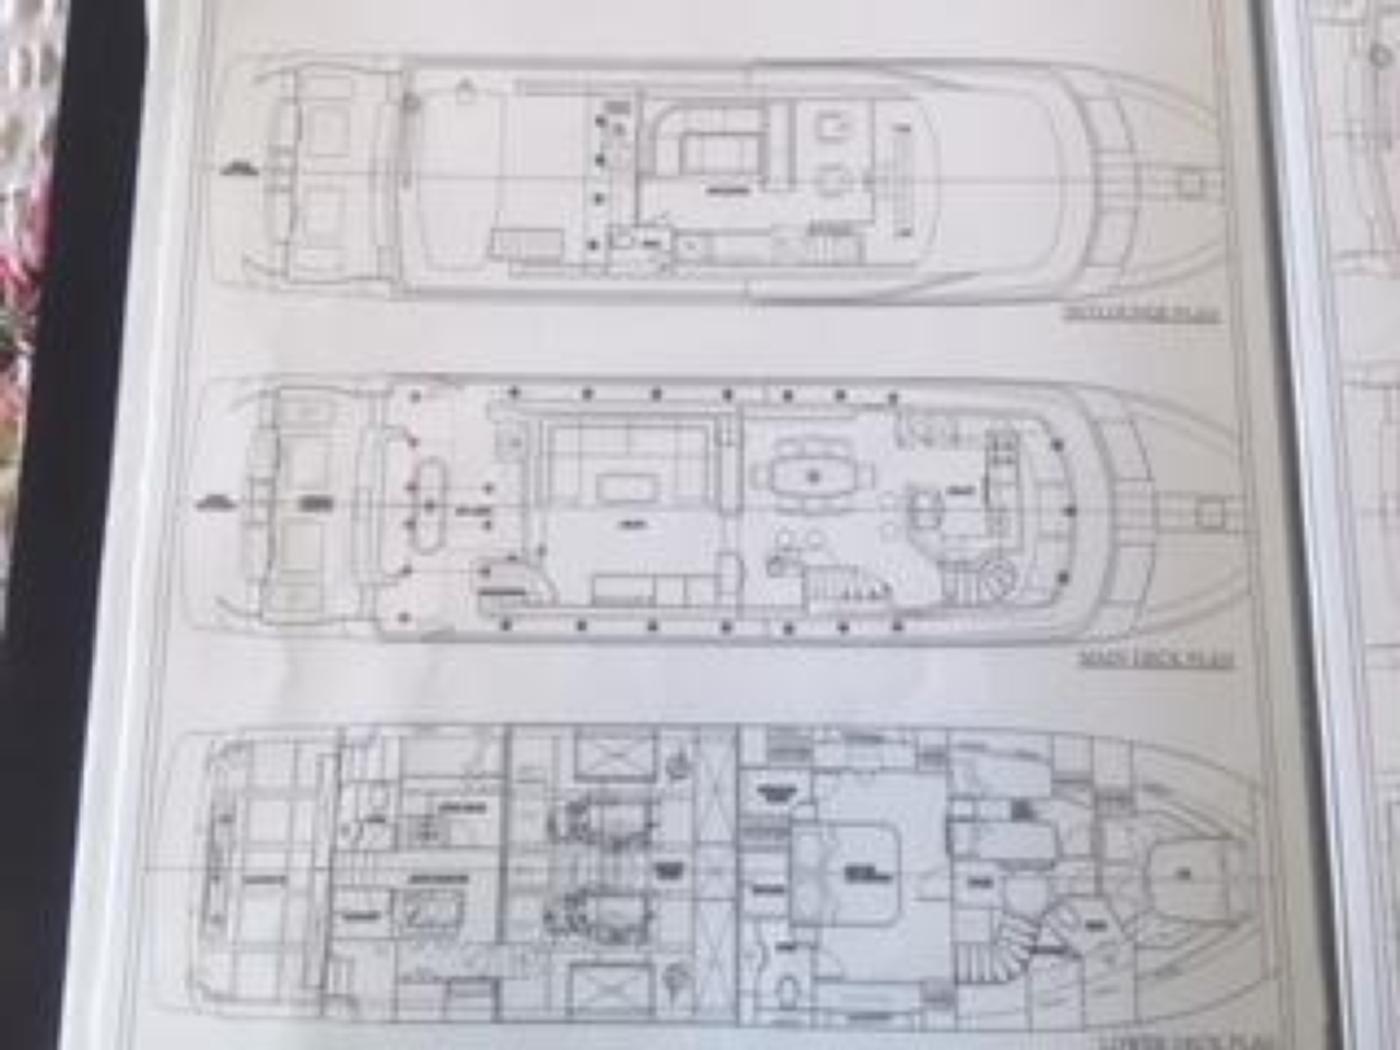 2011 Hampton 75 Endurance LRC, Drawings